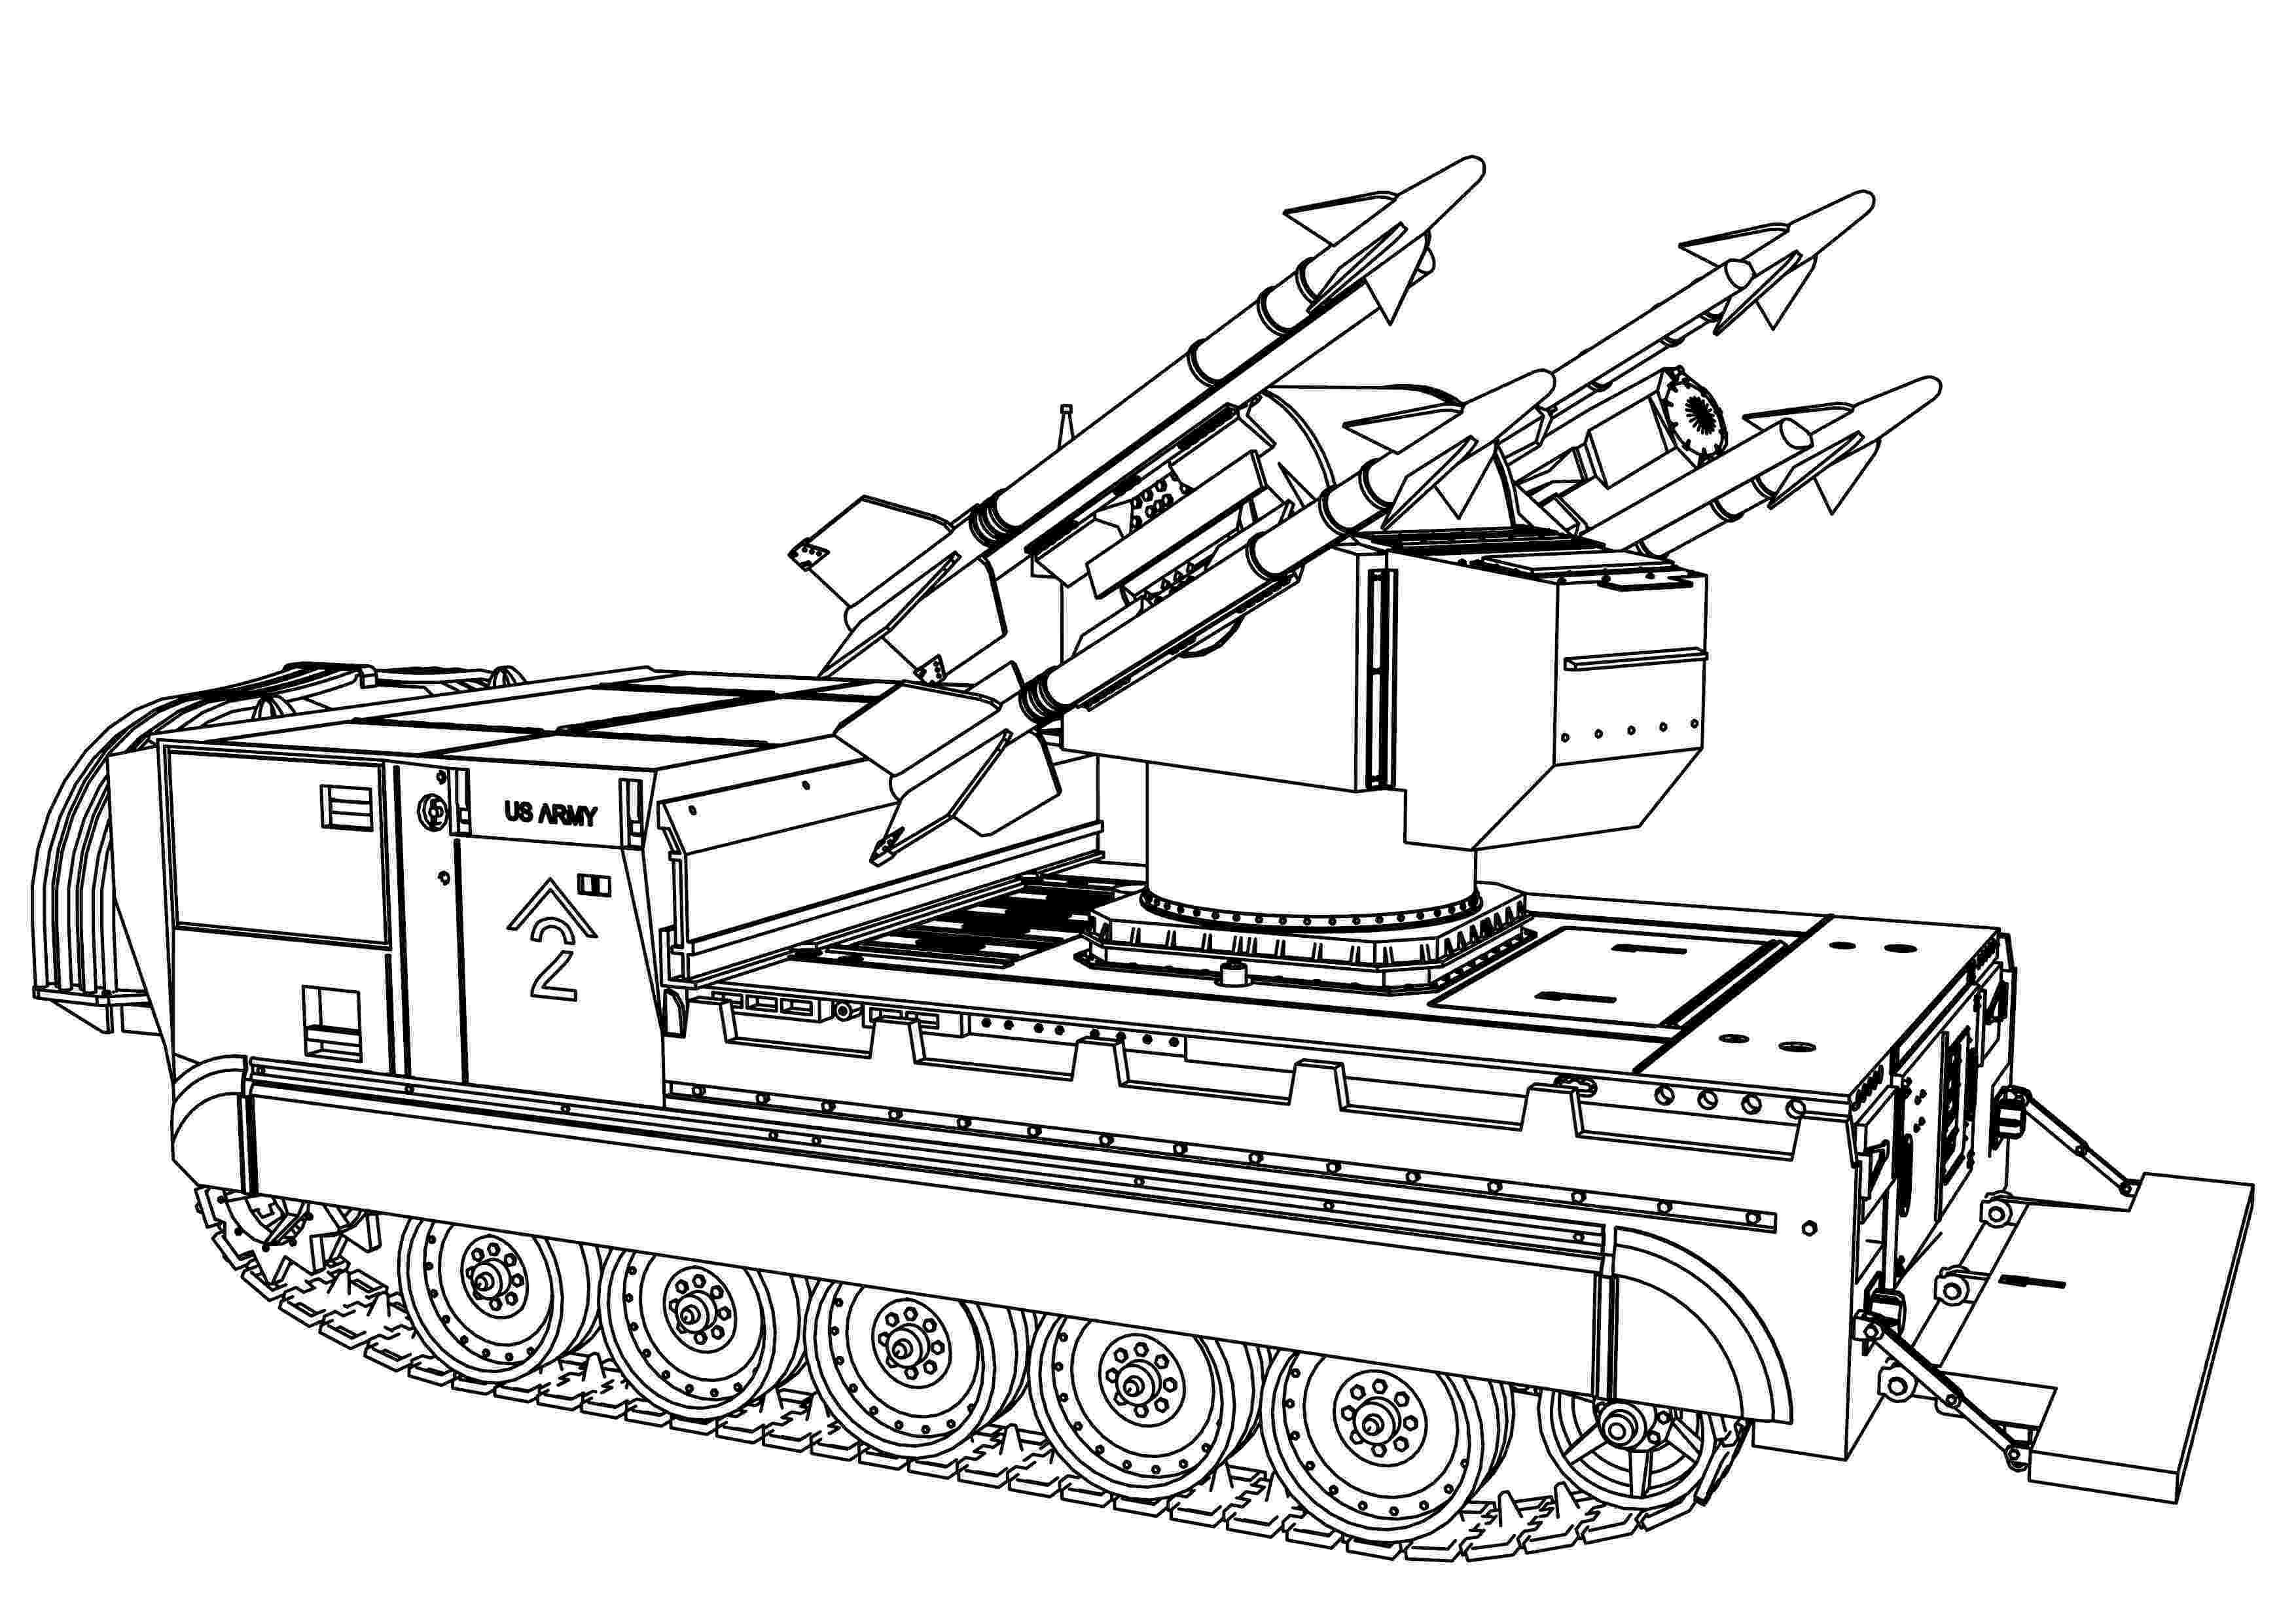 army tank coloring pages army tank coloring pages coloring pages army coloring tank pages